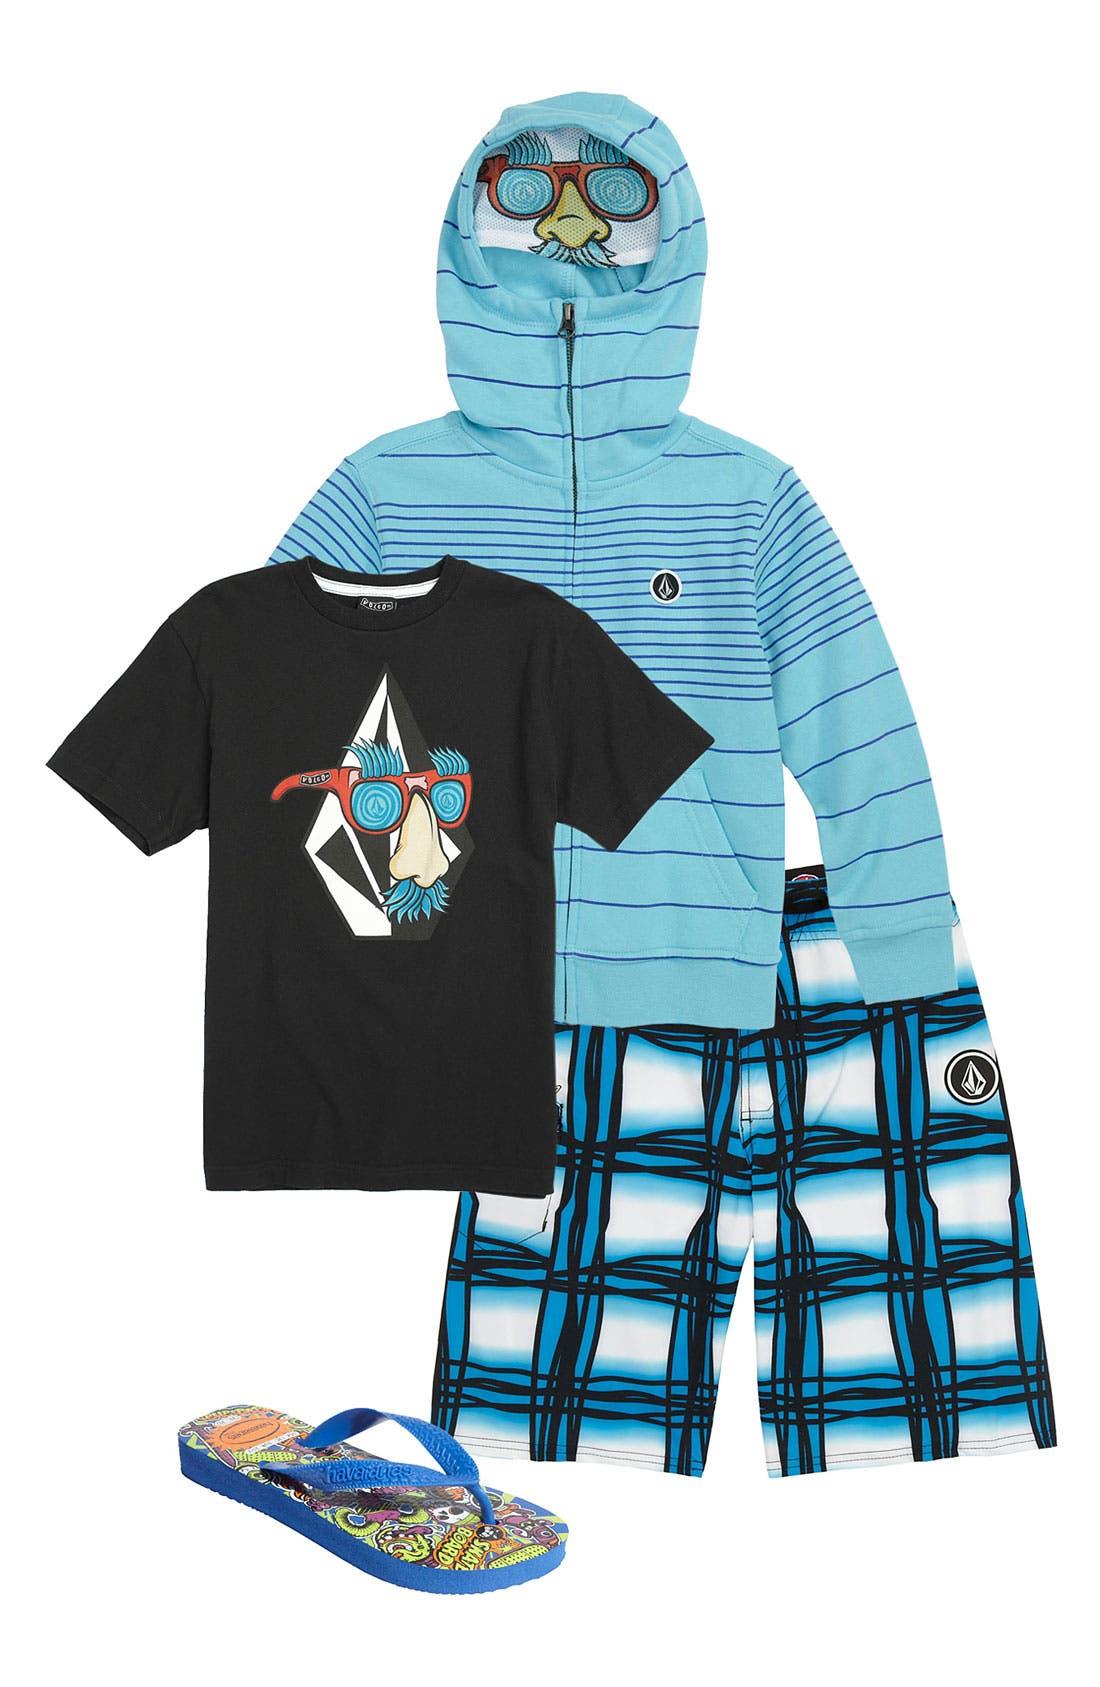 Main Image - Volcom T-Shirt, Hoodie & Board Shorts (Little Boys)